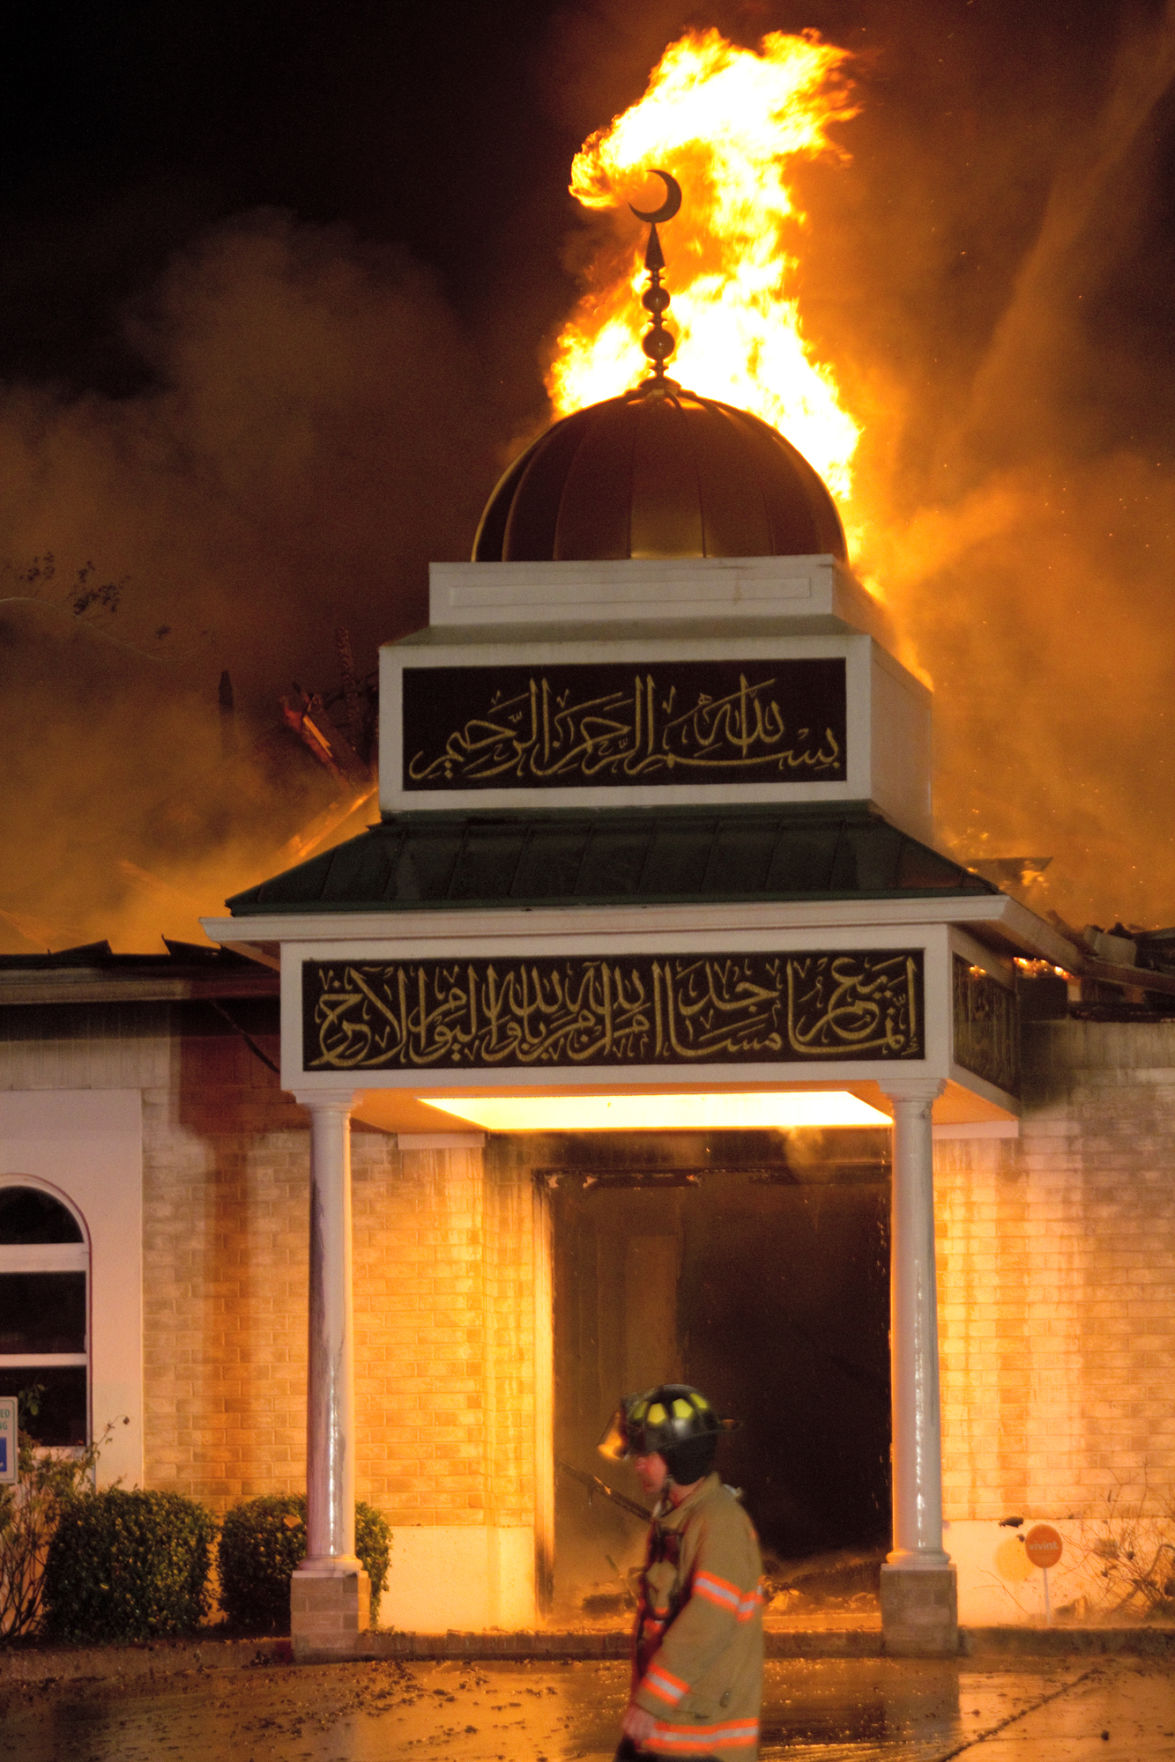 Victoria mosque fire ruled arson